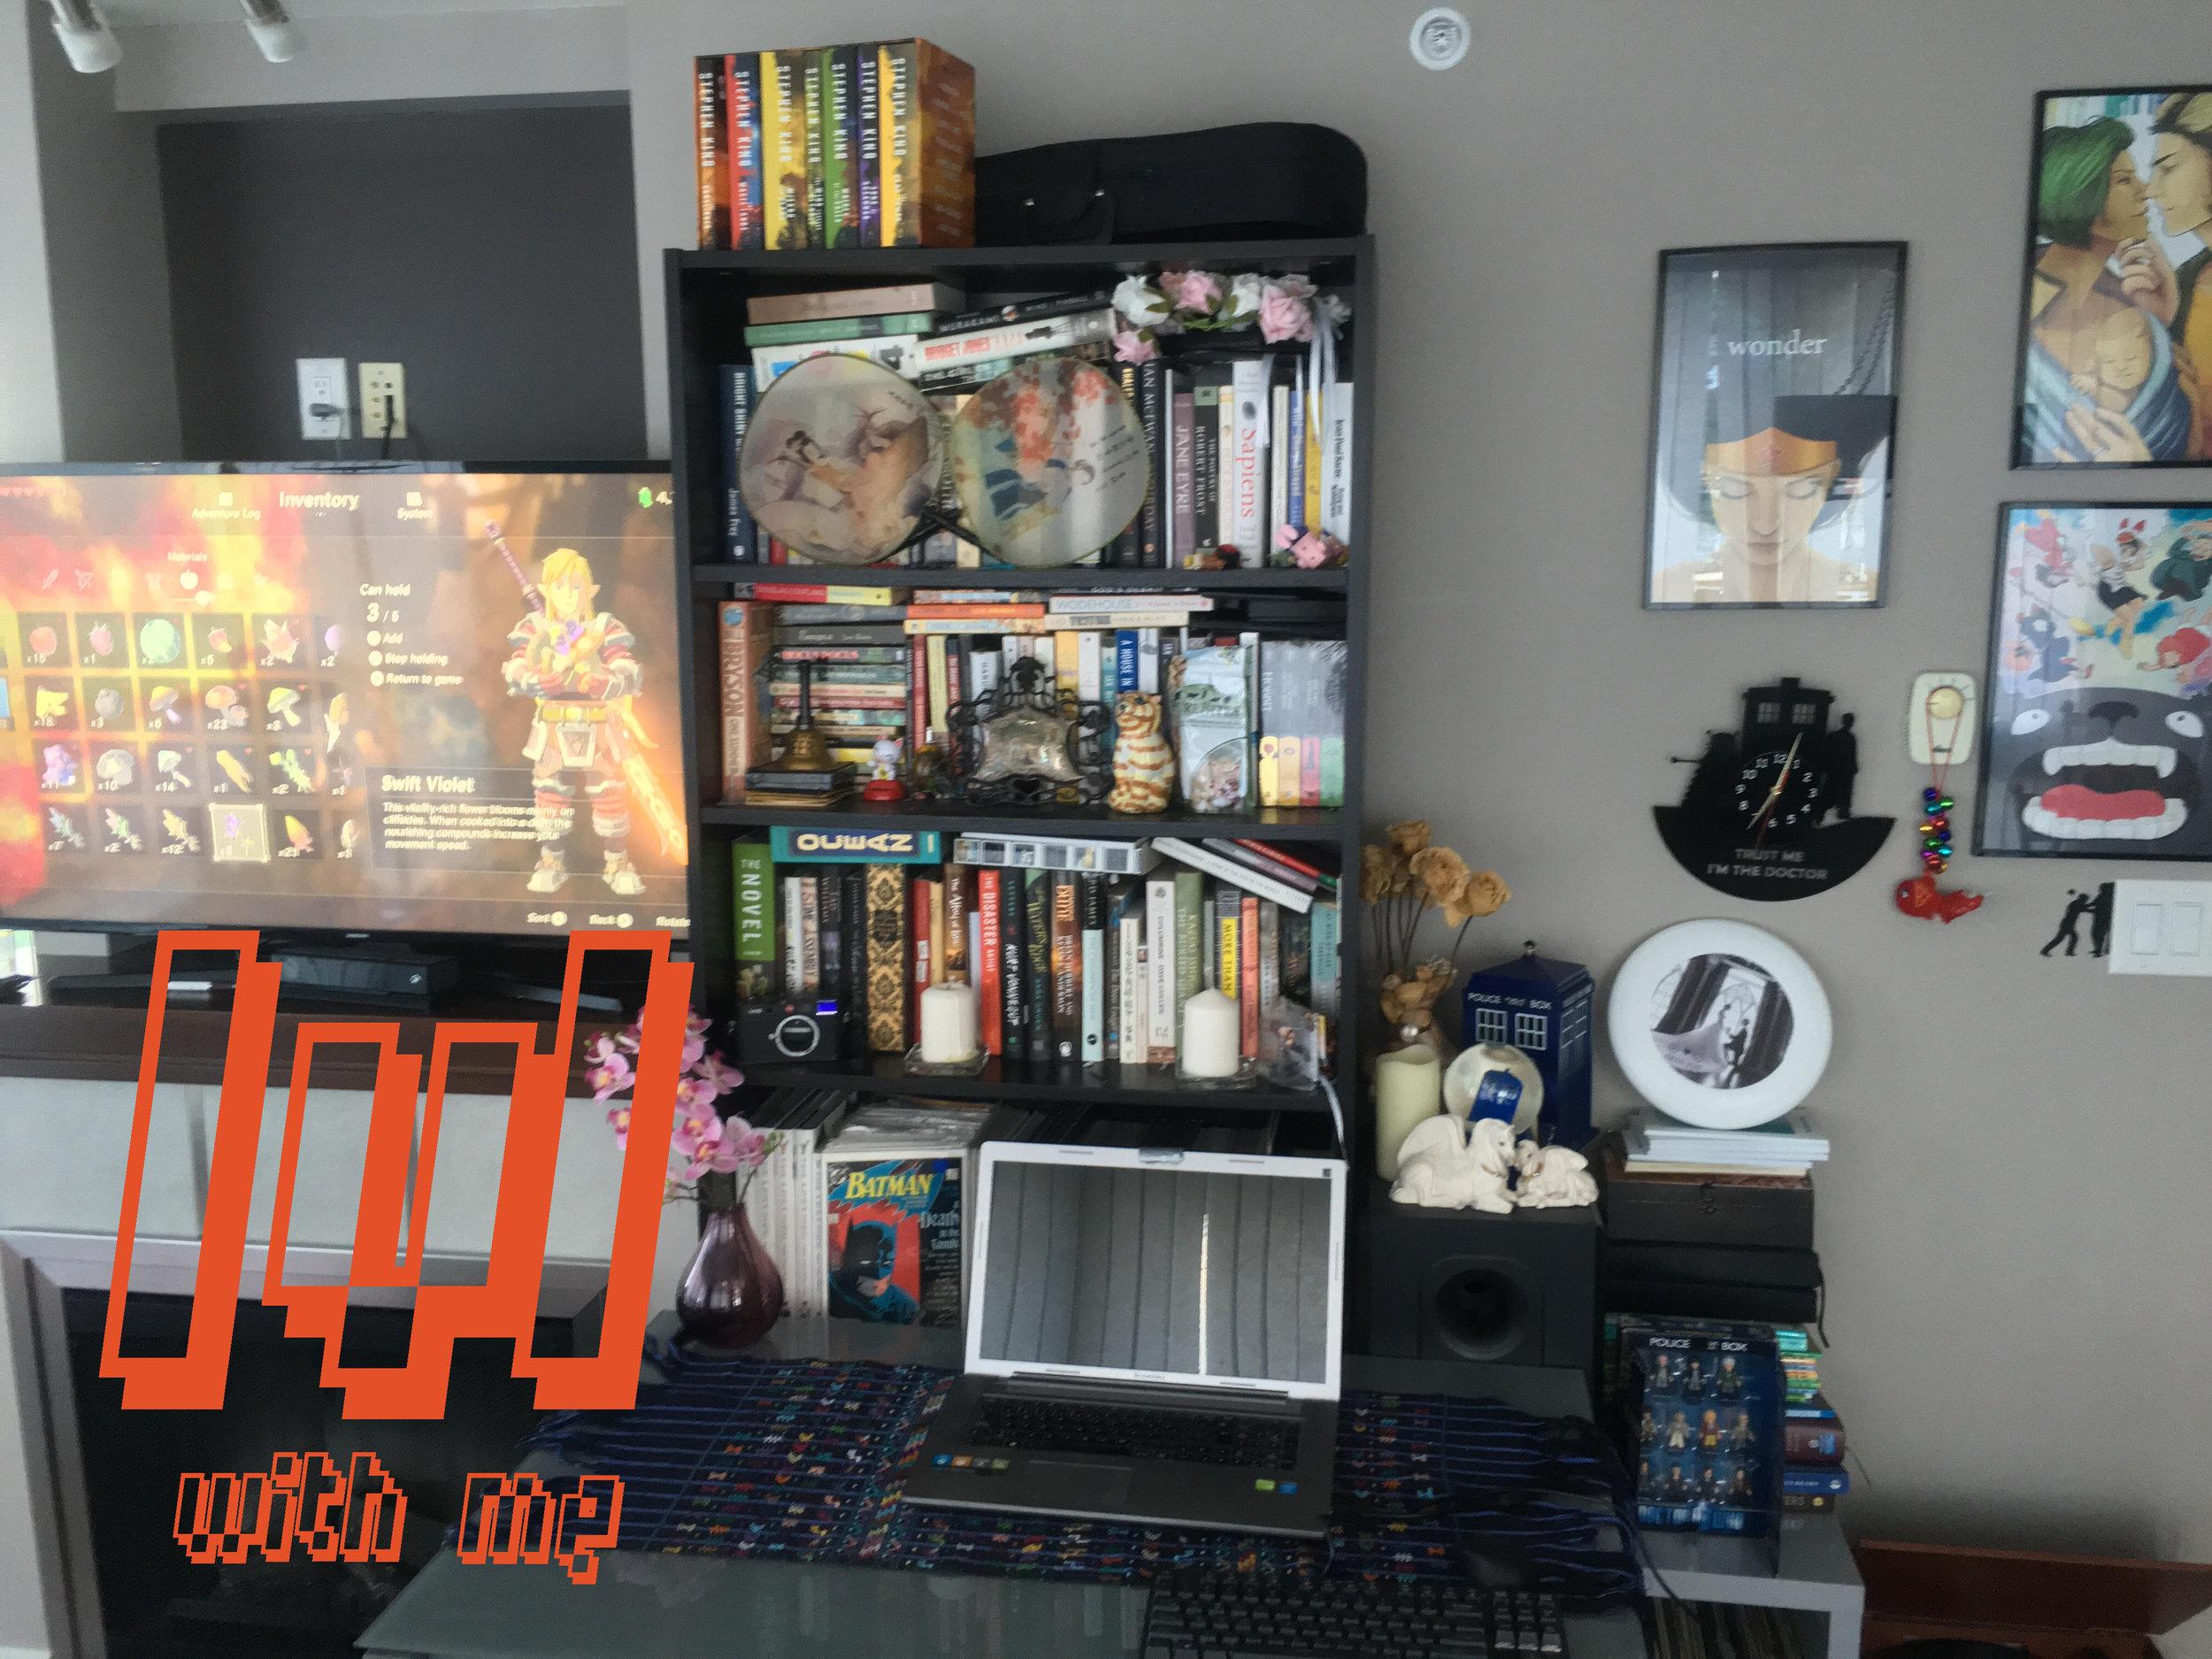 Brian Woodruff's workspace